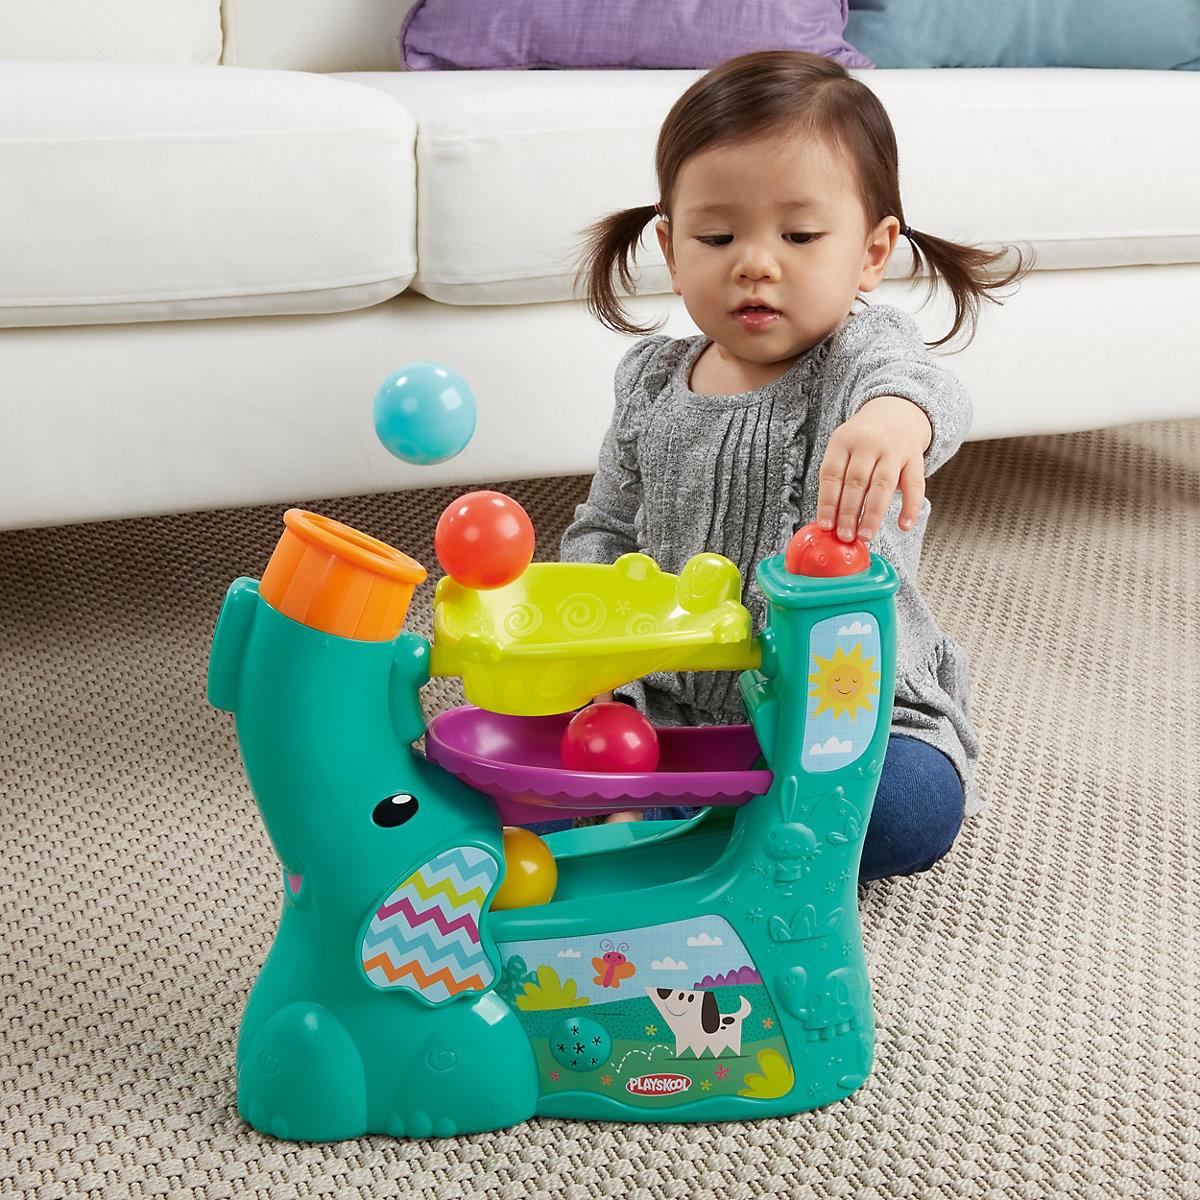 HASBRO Sorting, Nesting & Stacking Toys 4915060 educational games animals toy MTpromo - 4